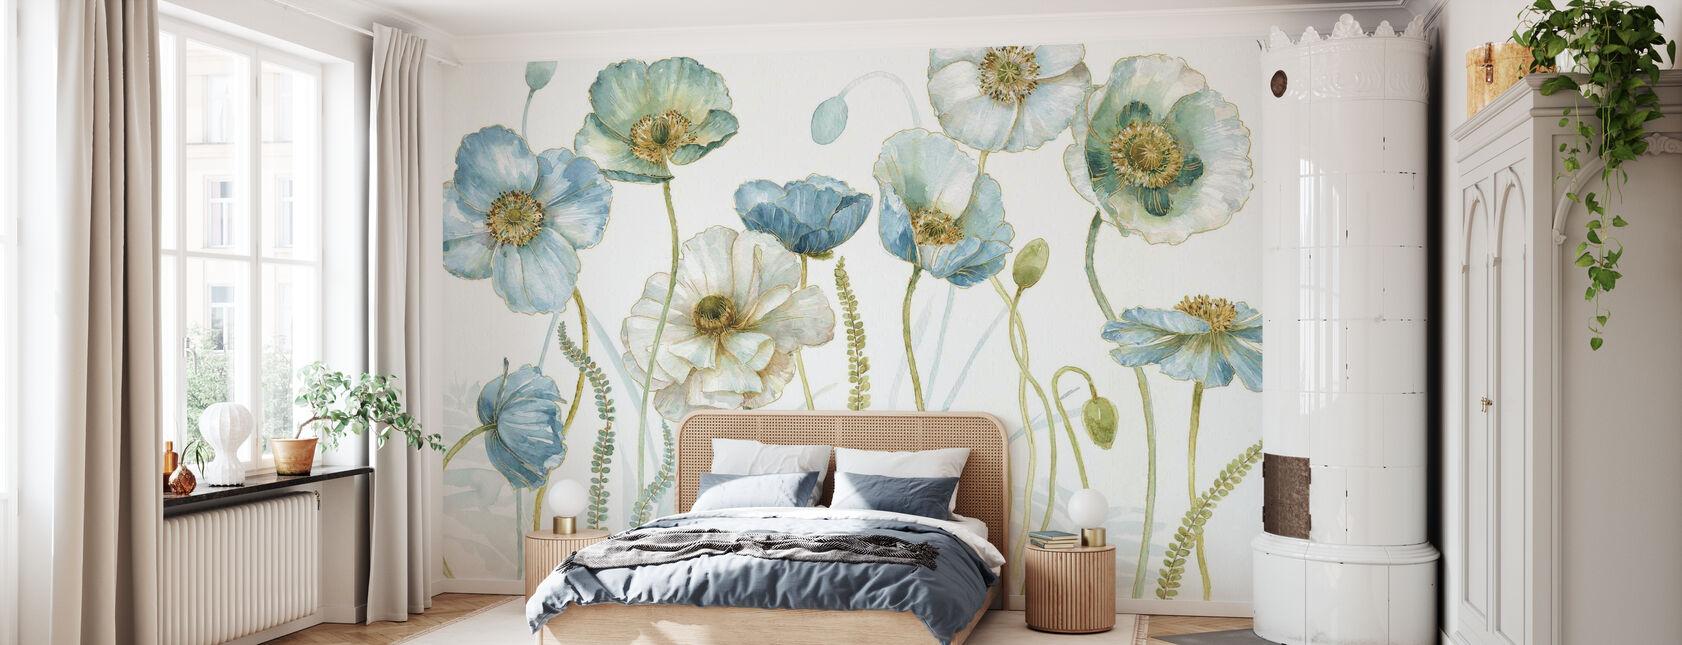 My Greenhouse Flowers 2 - Wallpaper - Bedroom